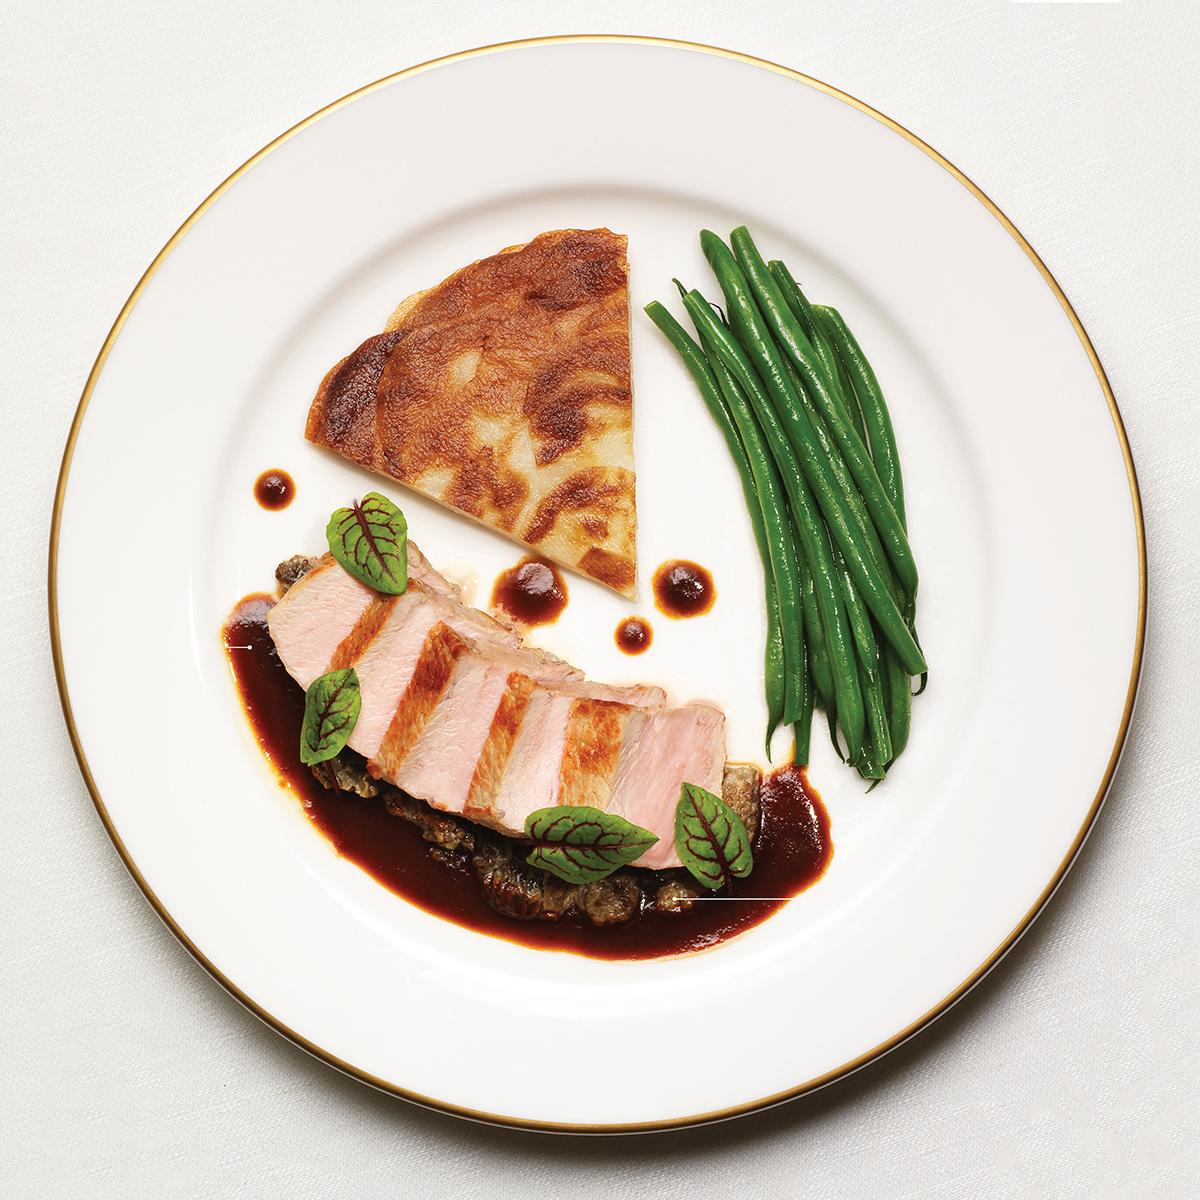 les sablons harvard square cambridge veal loin dish - Les Kitchen